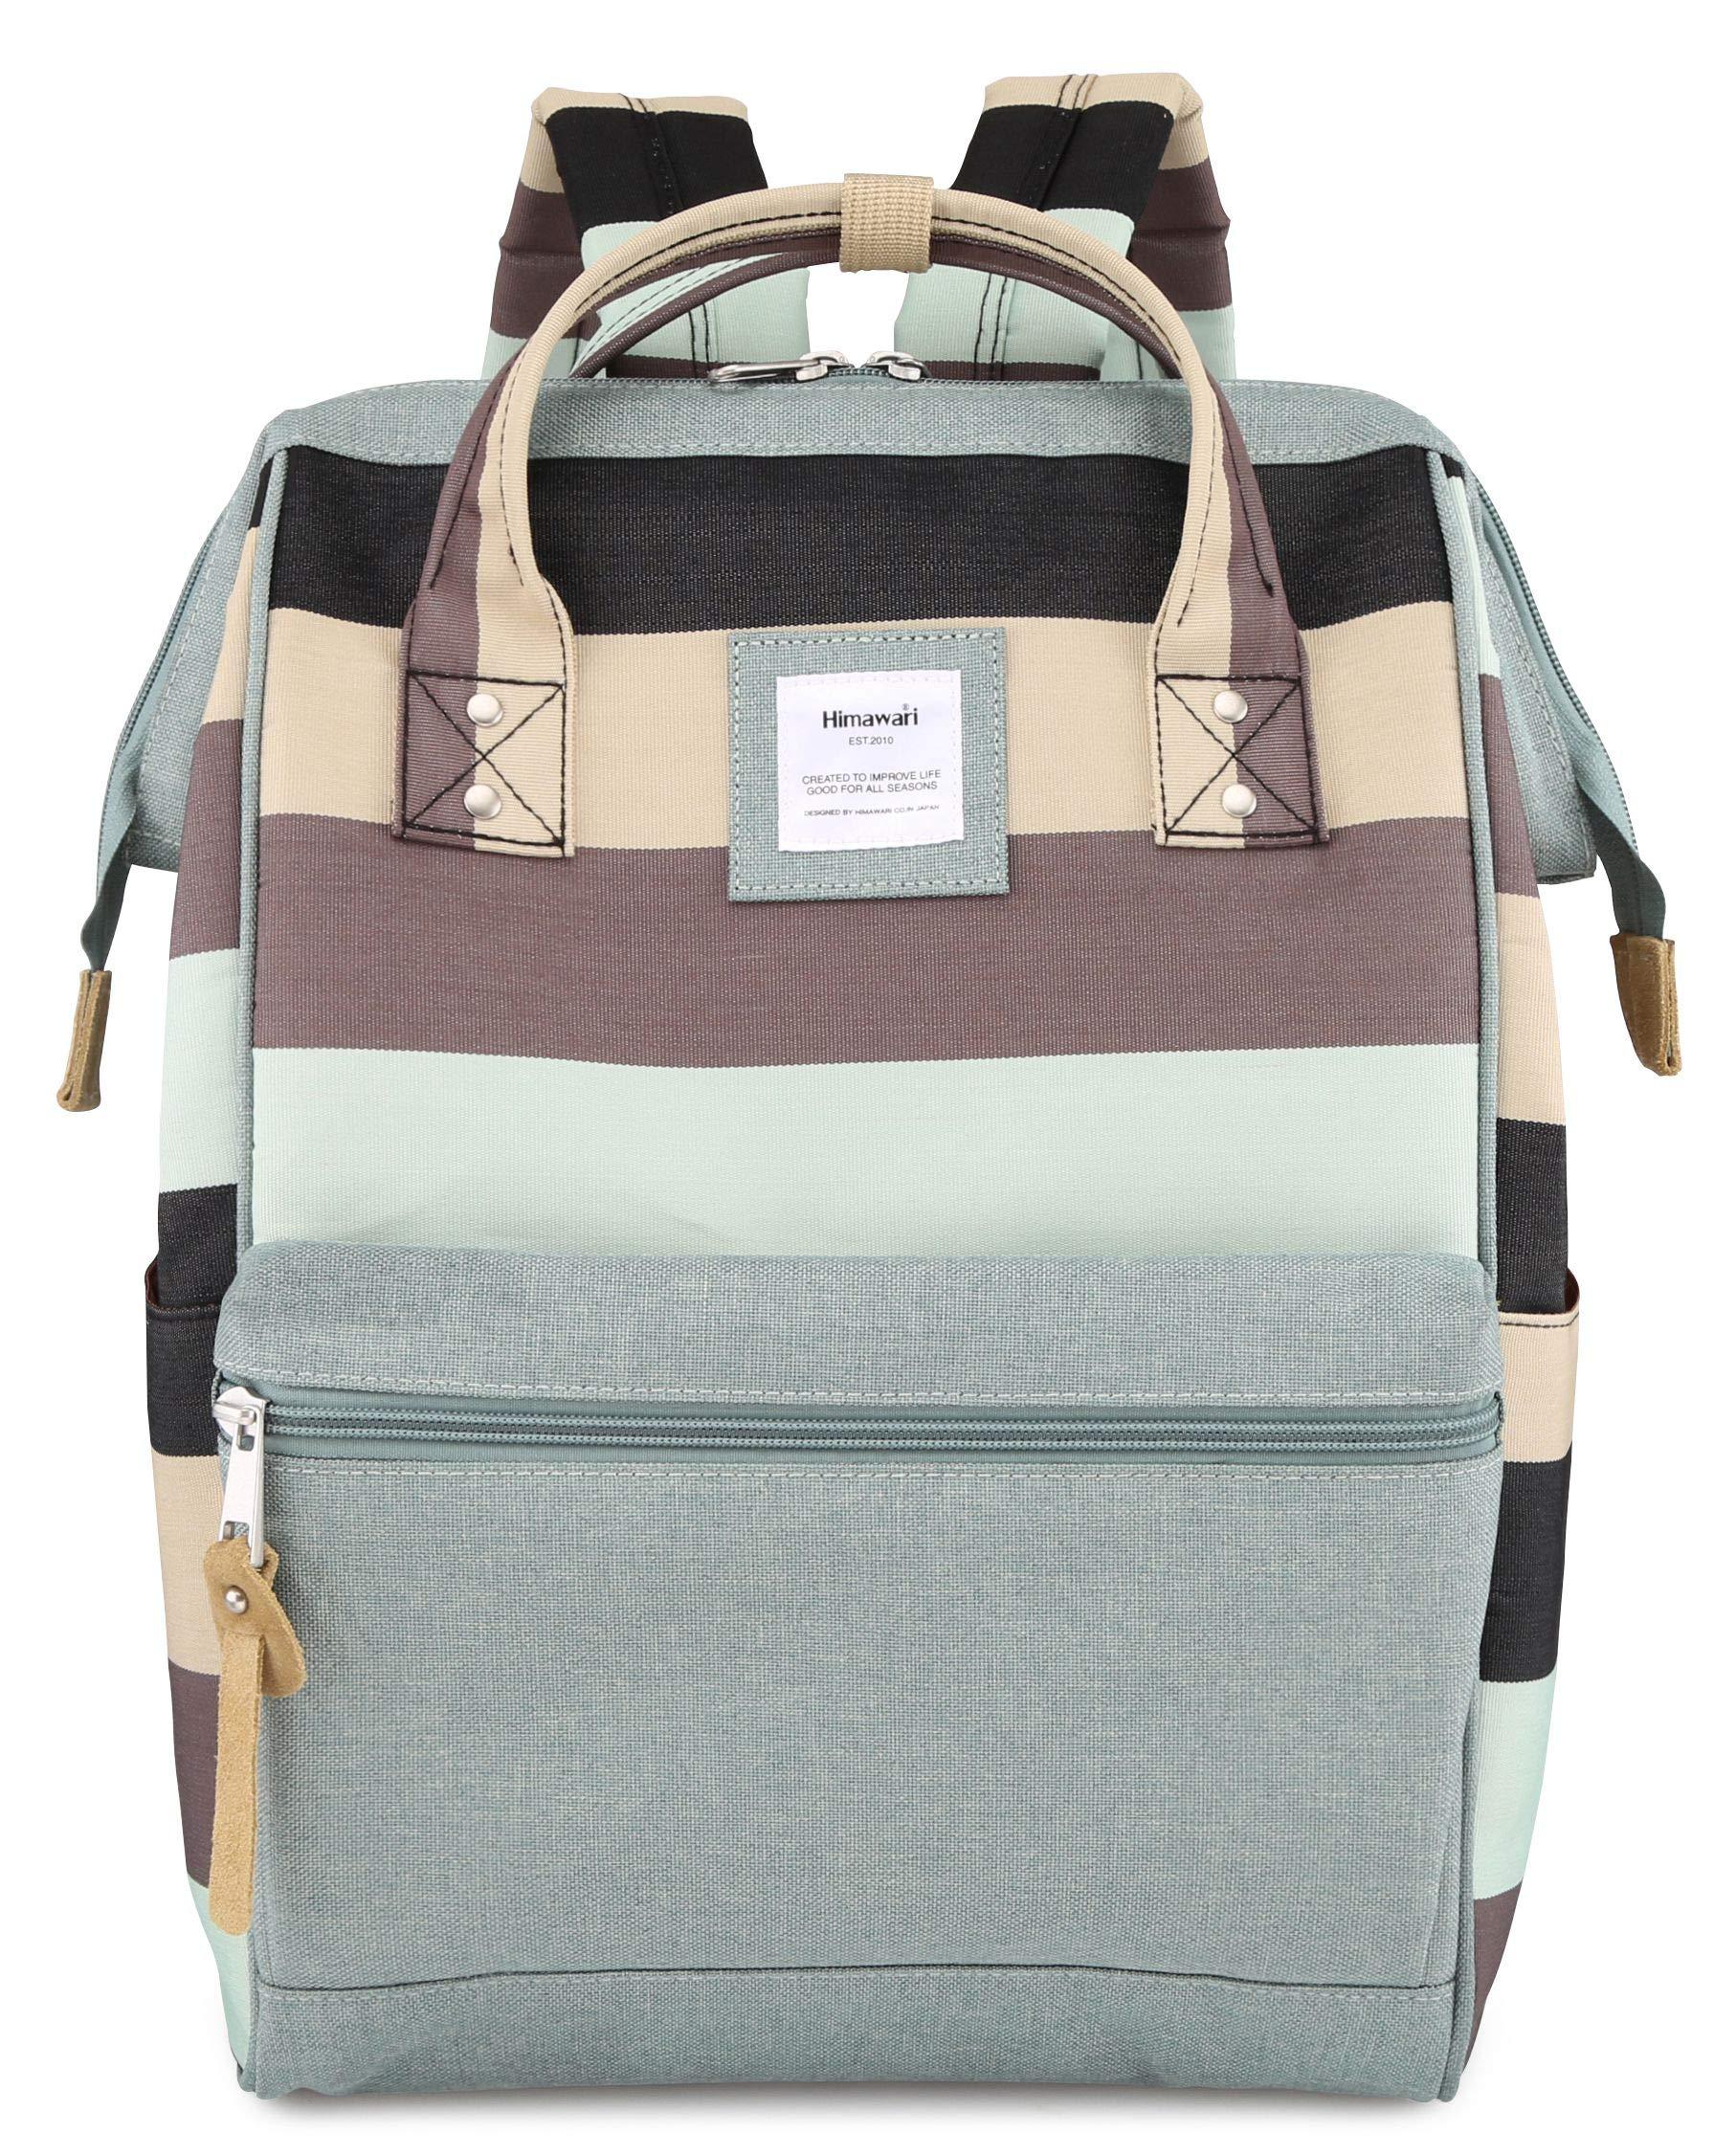 Himawari School Travel Backpack with USB Port 16 Inch Waterproof Doctor Work Diaper Bag for Women Men College Boys Girls, Regular(USB L- TWL) by himawari